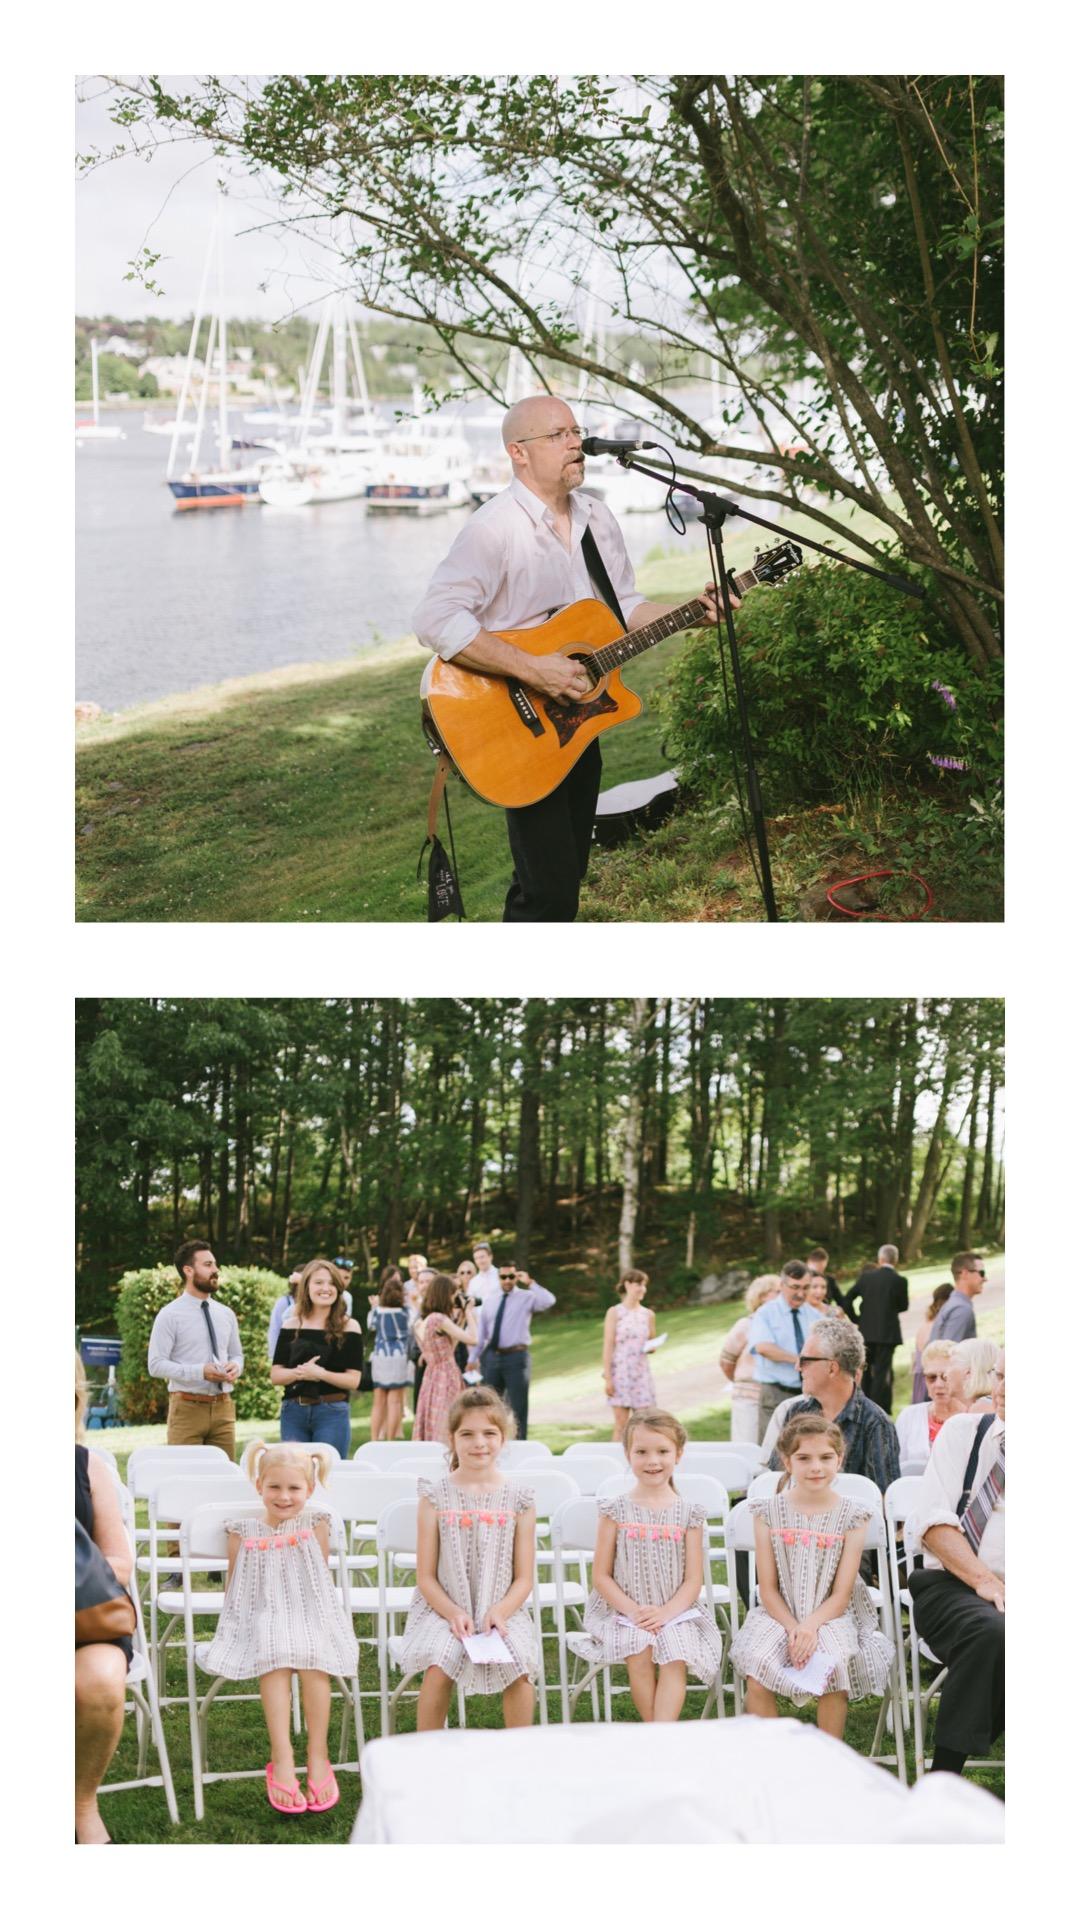 Martina & Scott Halifax Wedding Photographer - Sinead Dubeau Photography 11